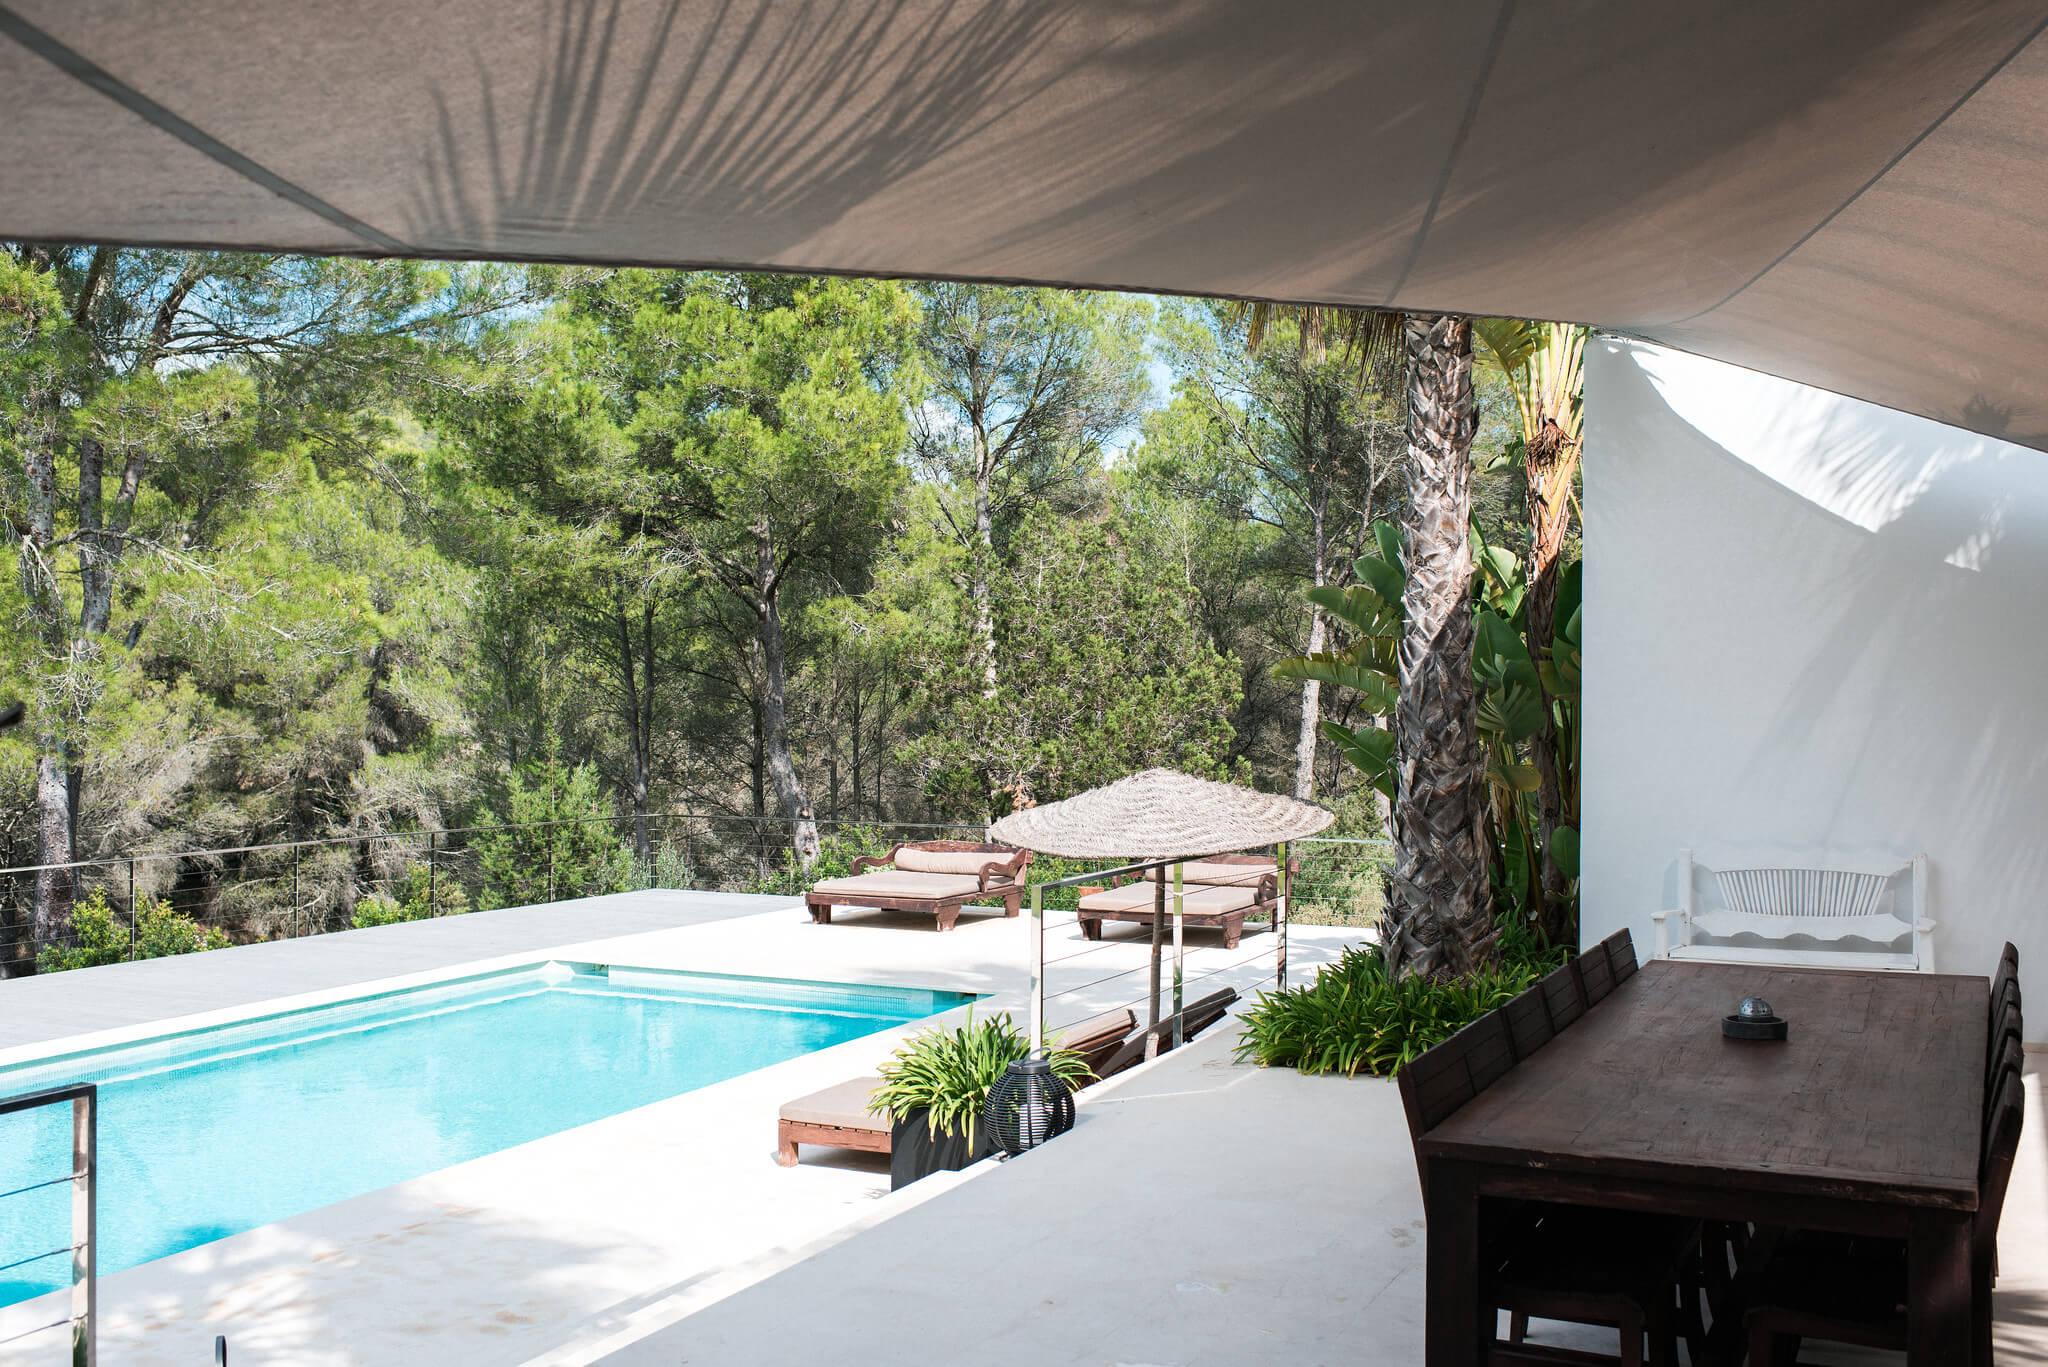 https://www.white-ibiza.com/wp-content/uploads/2020/05/white-ibiza-villas-casa-estrella-exterior-pool-from-house.jpg